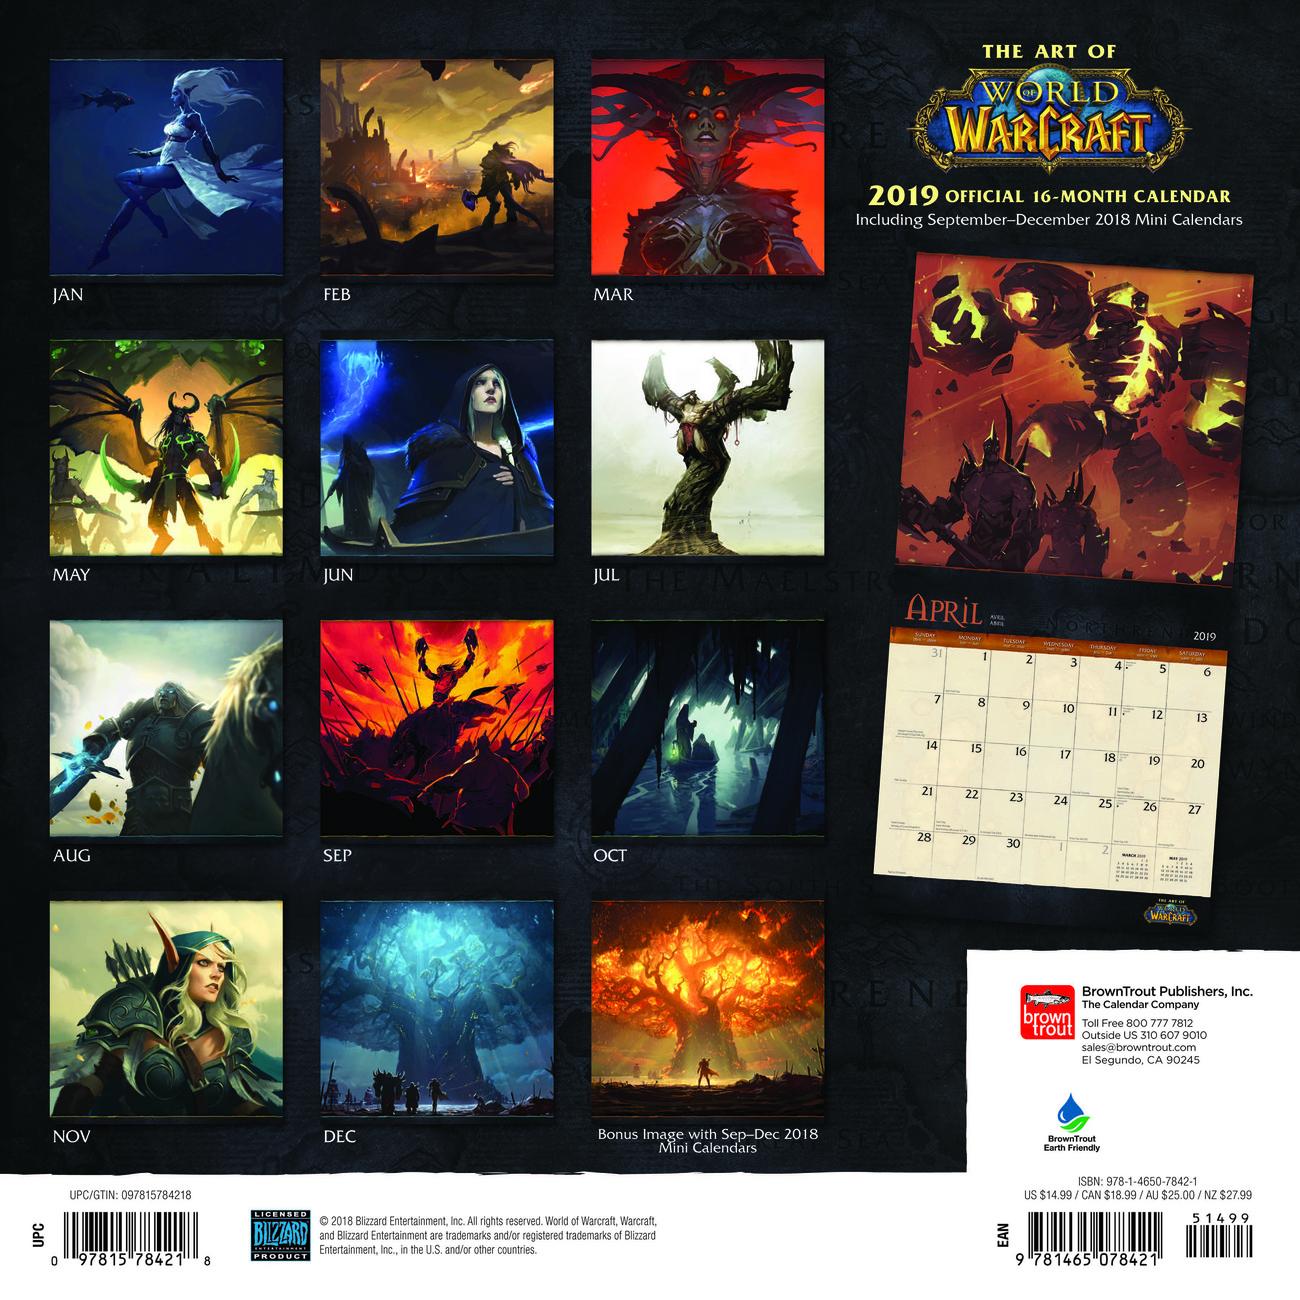 Wow Calendar 2022.World Of Warcraft Kalendarze Scienne 2022 Kup Na Posters Pl